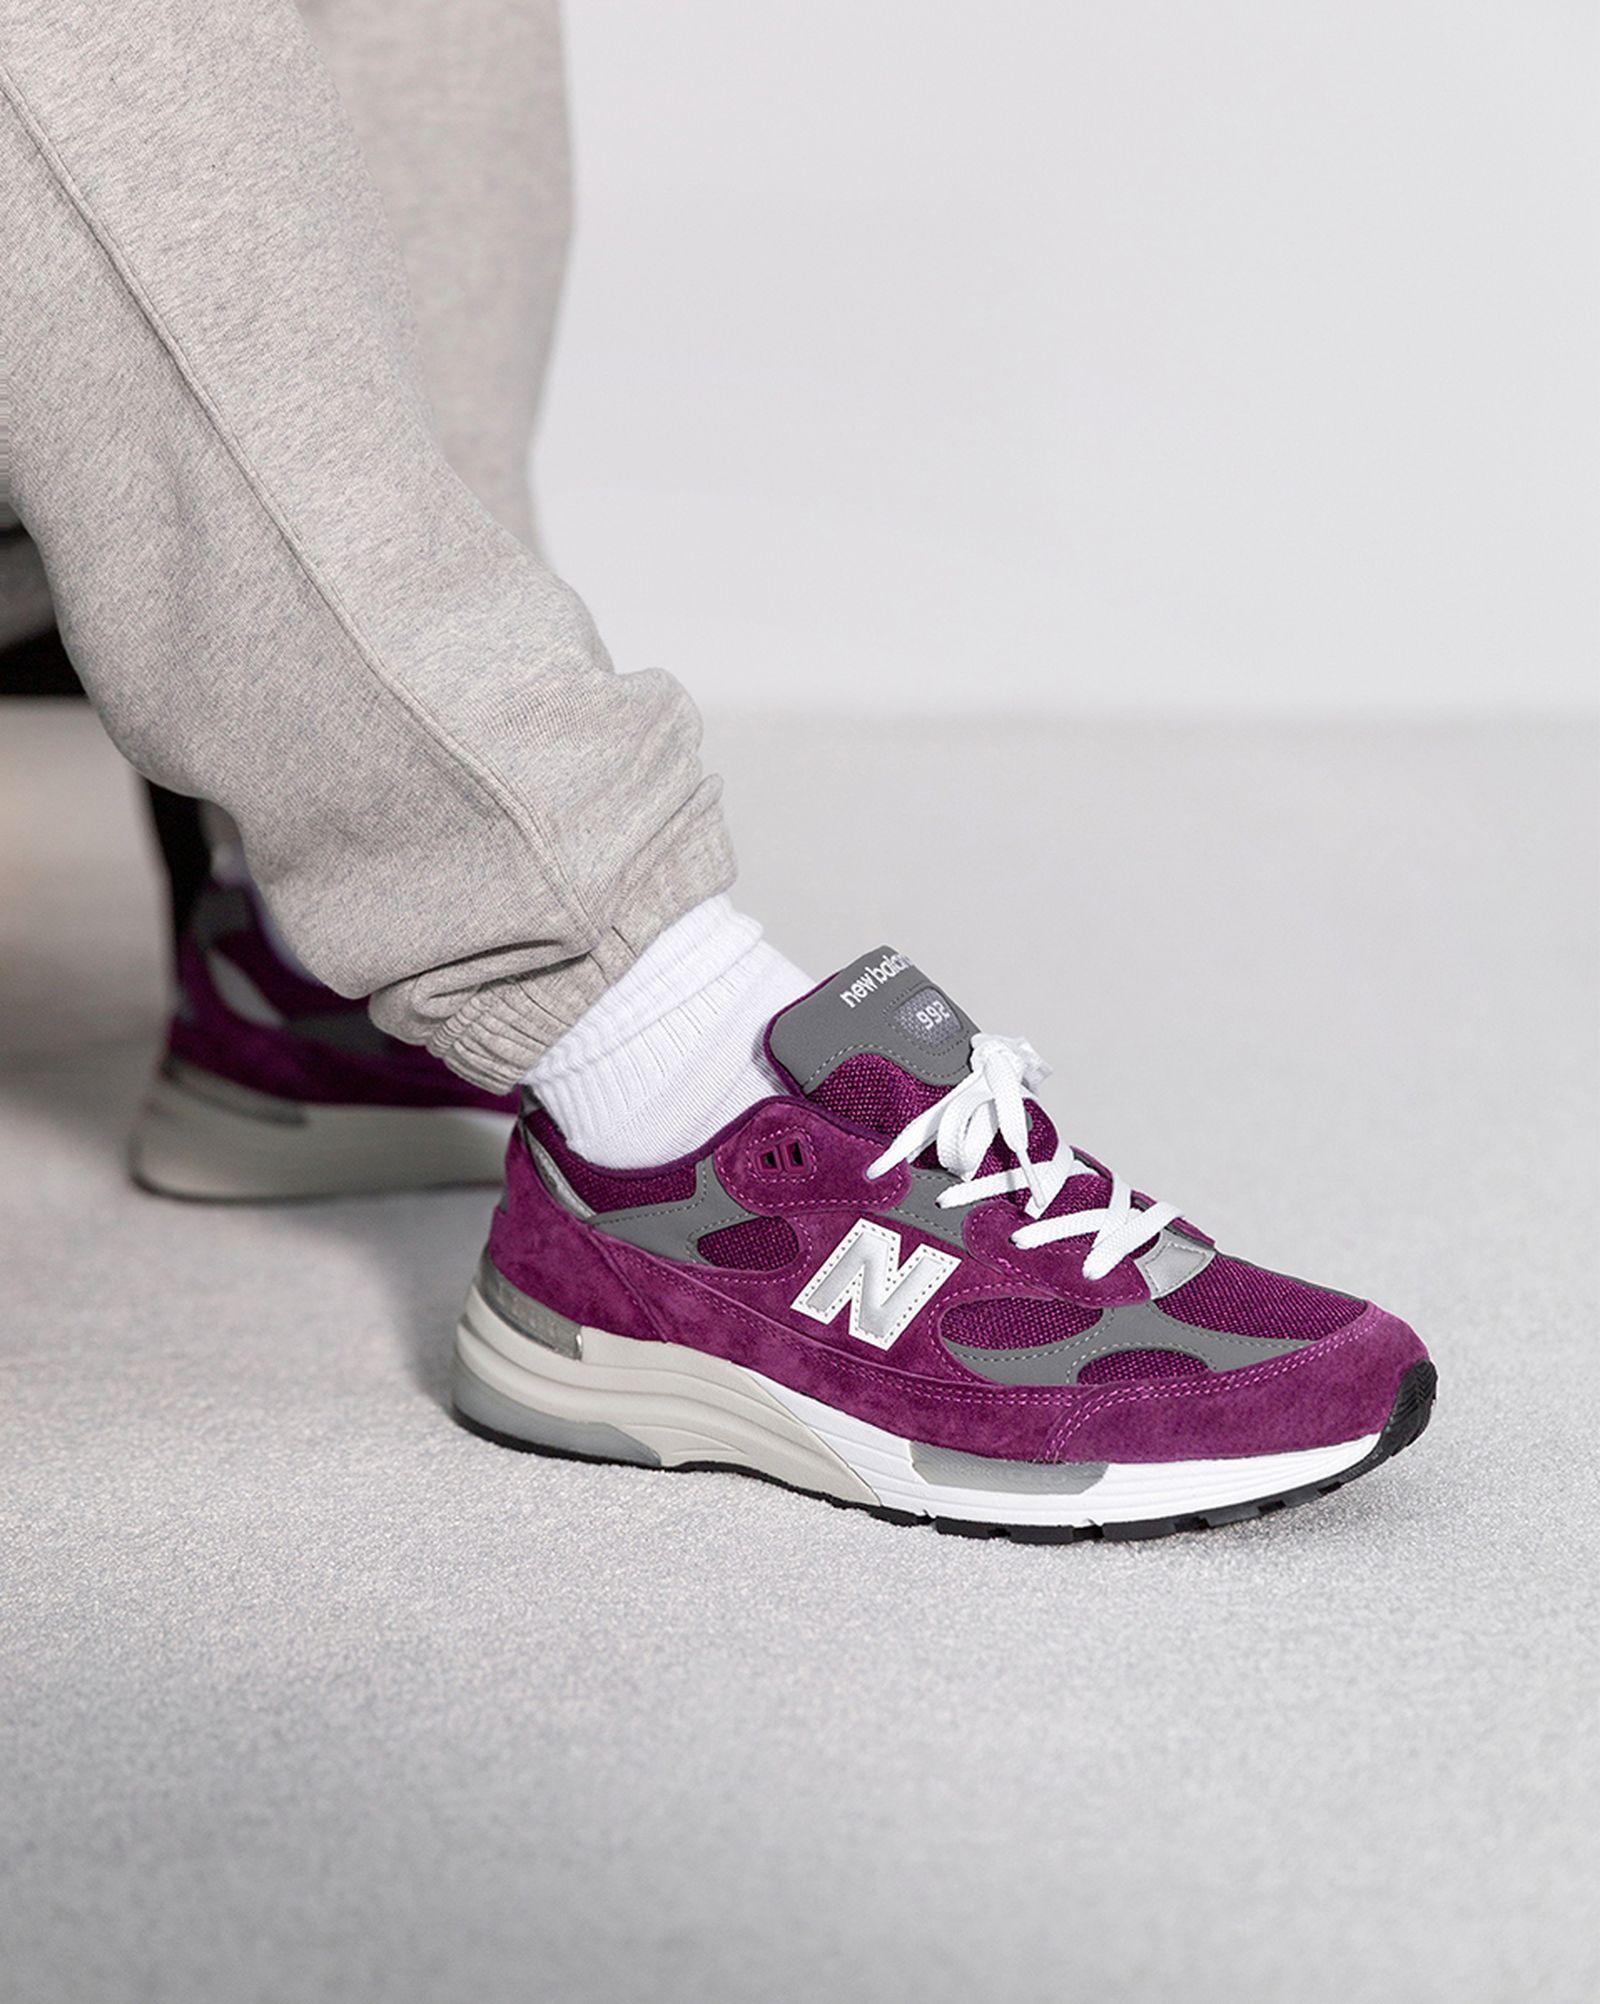 new-balance-992-purple-grey-release-date-price-04